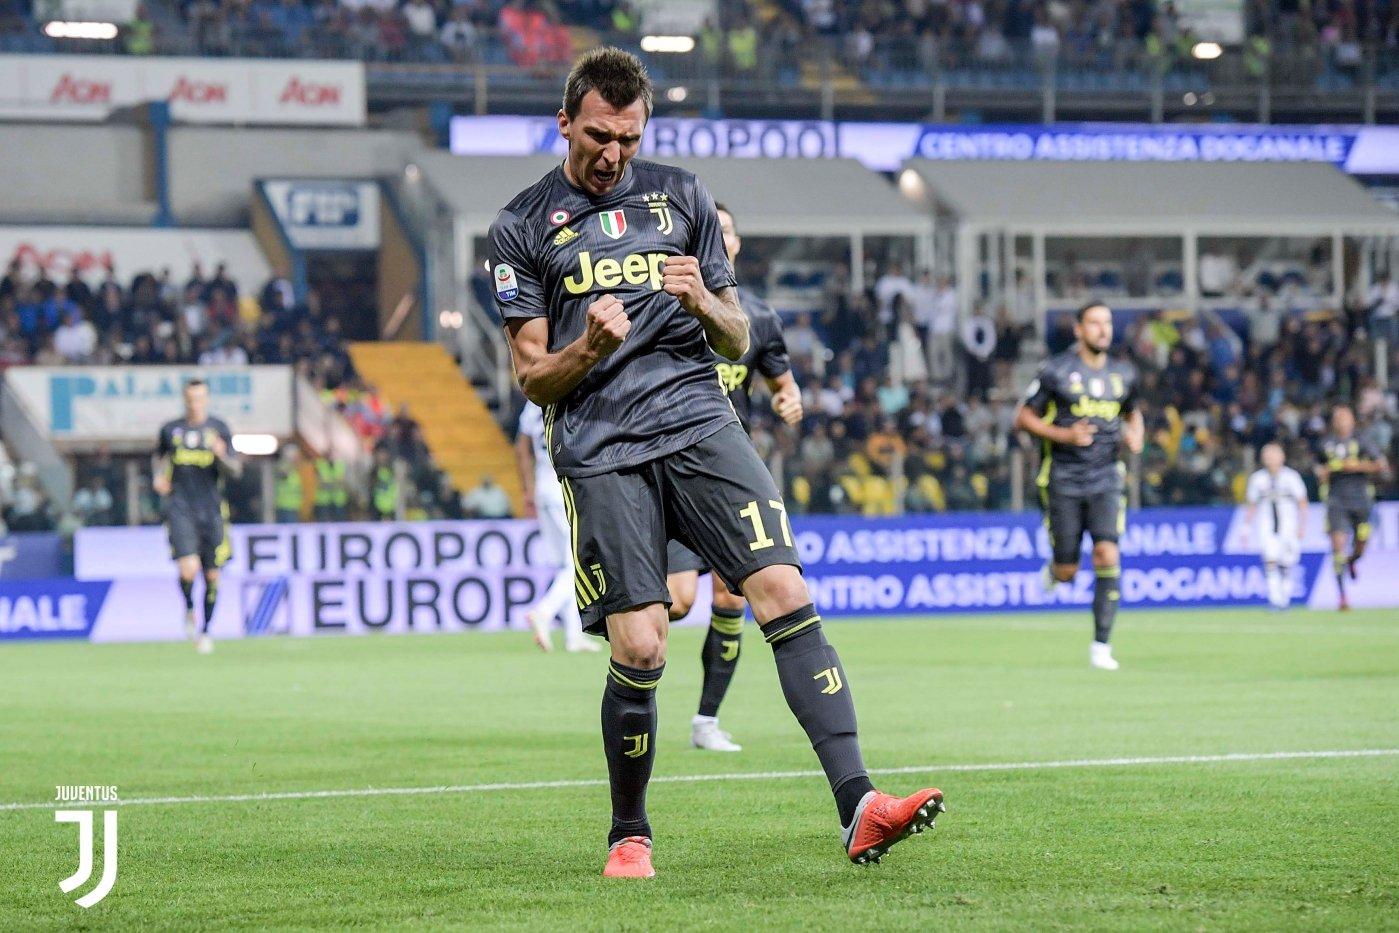 Serie A 2018/2019: la Juventus vola 9 Serie A 2018/2019: la Juventus vola